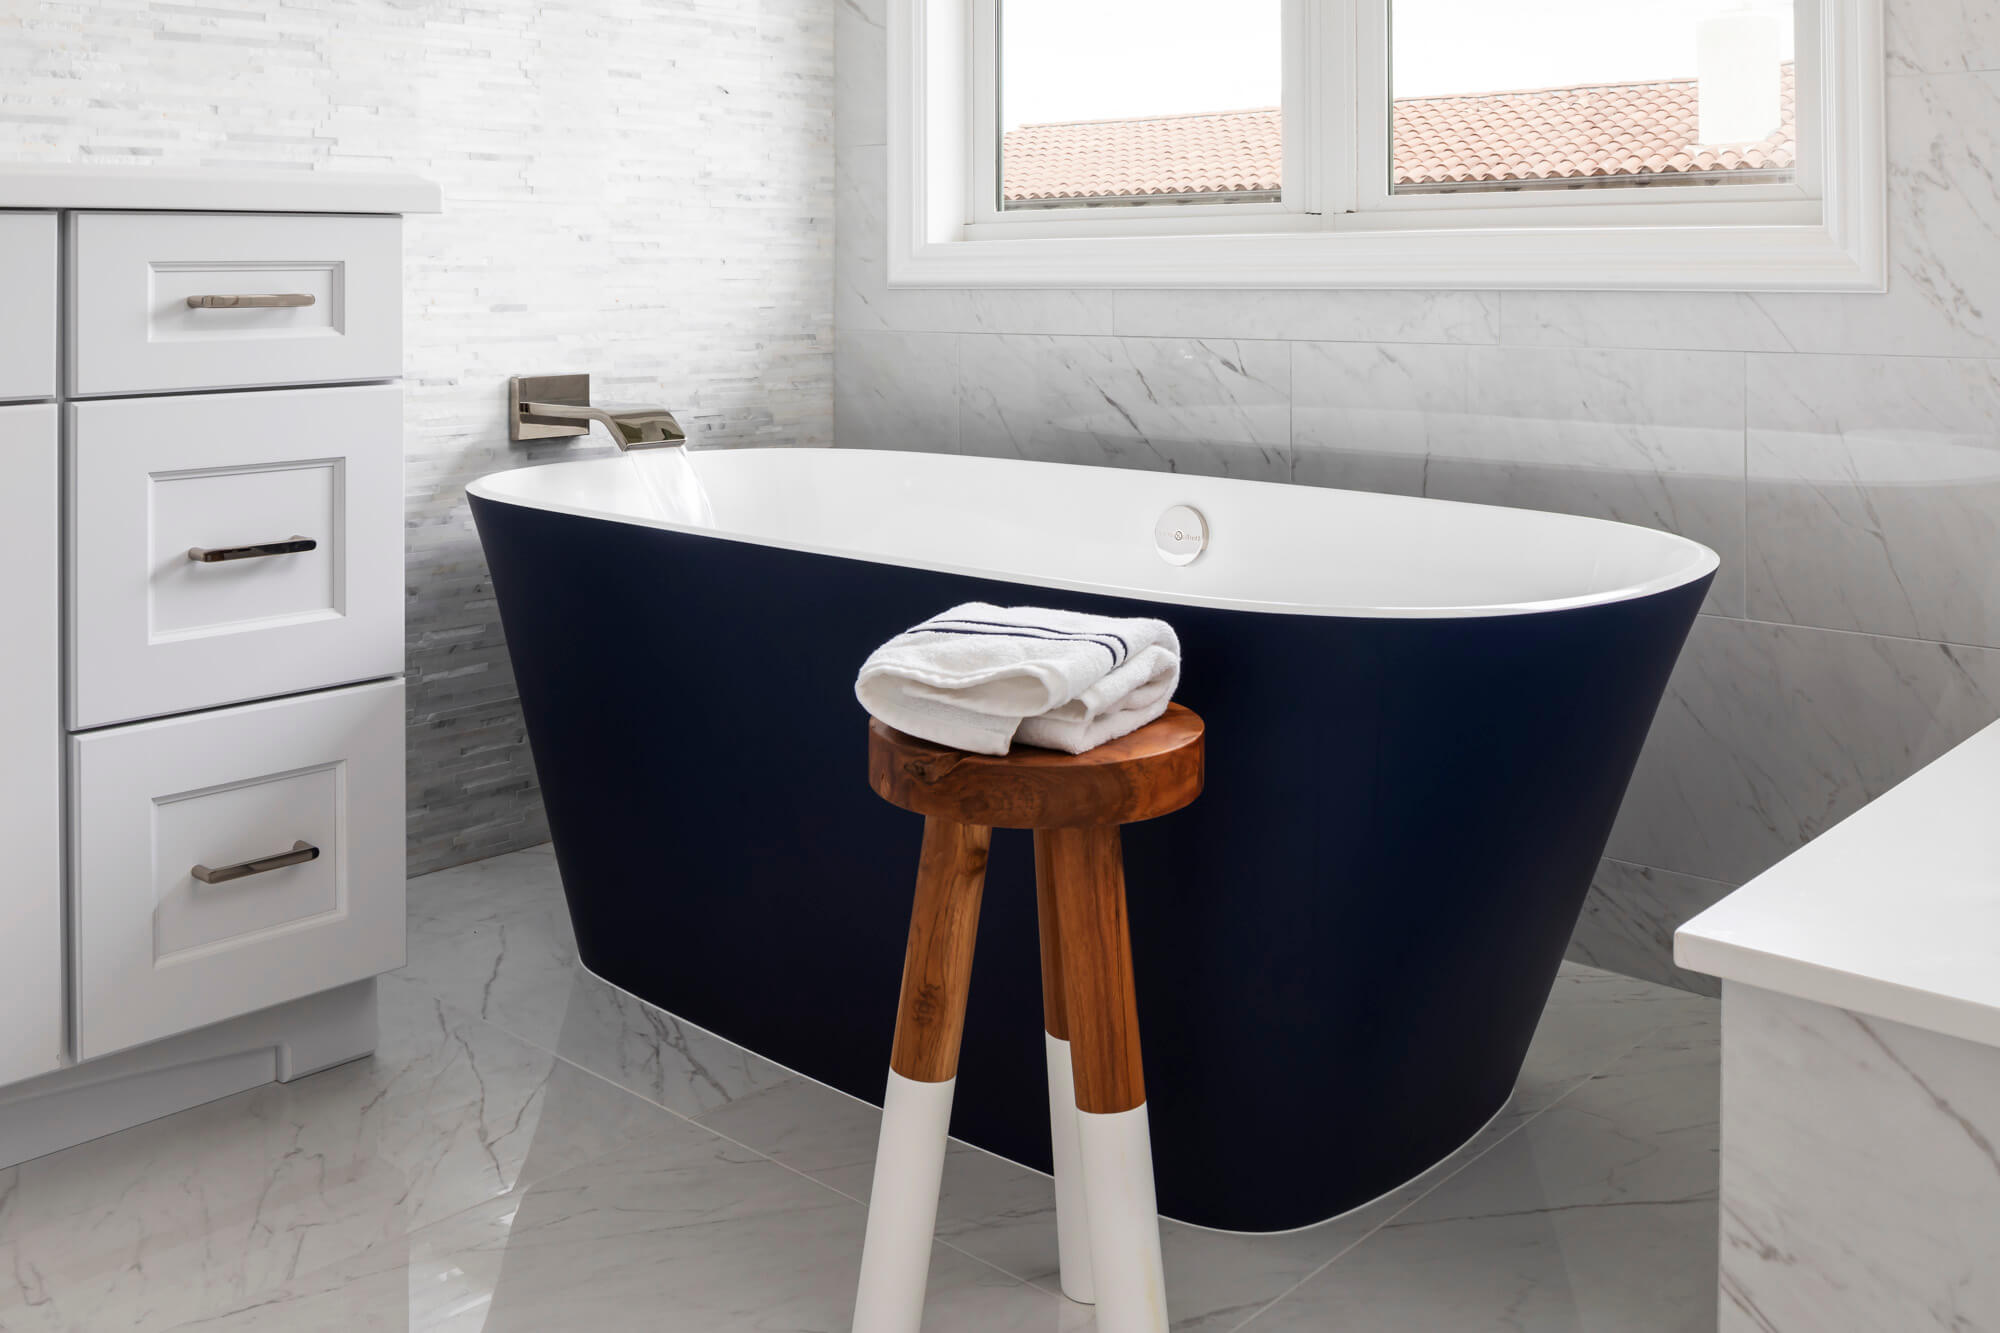 : Black bathtub in white bathroom